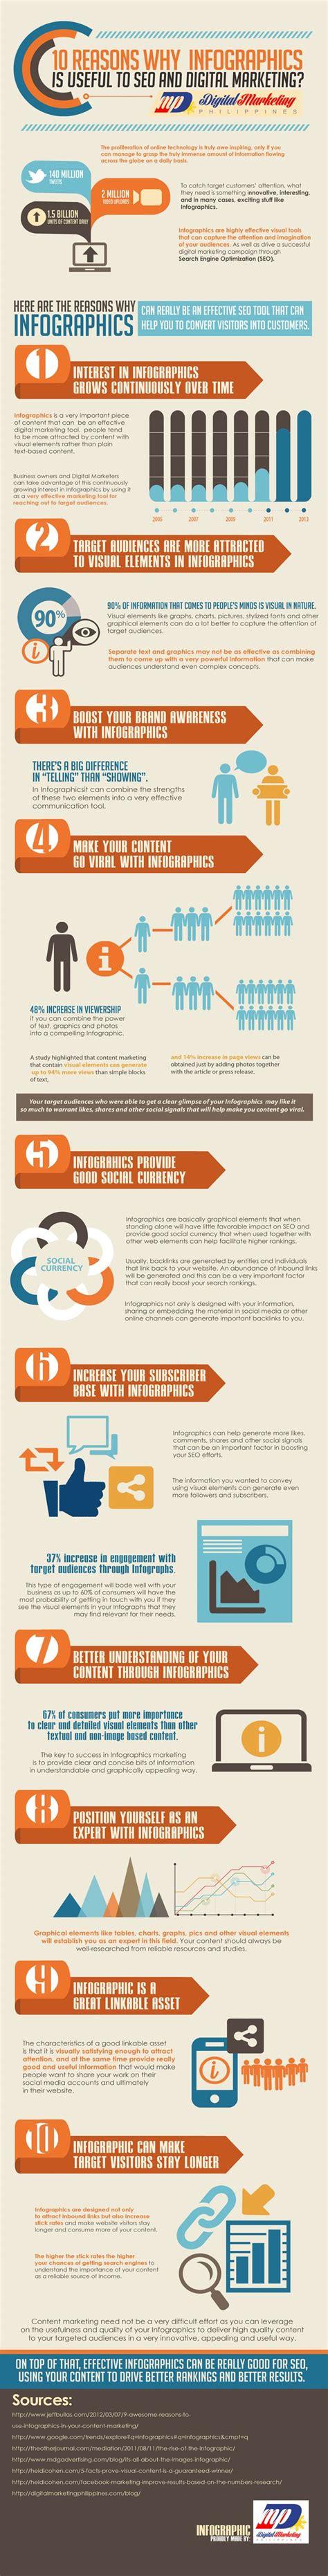 infographics can drive a successful digitalmarketing